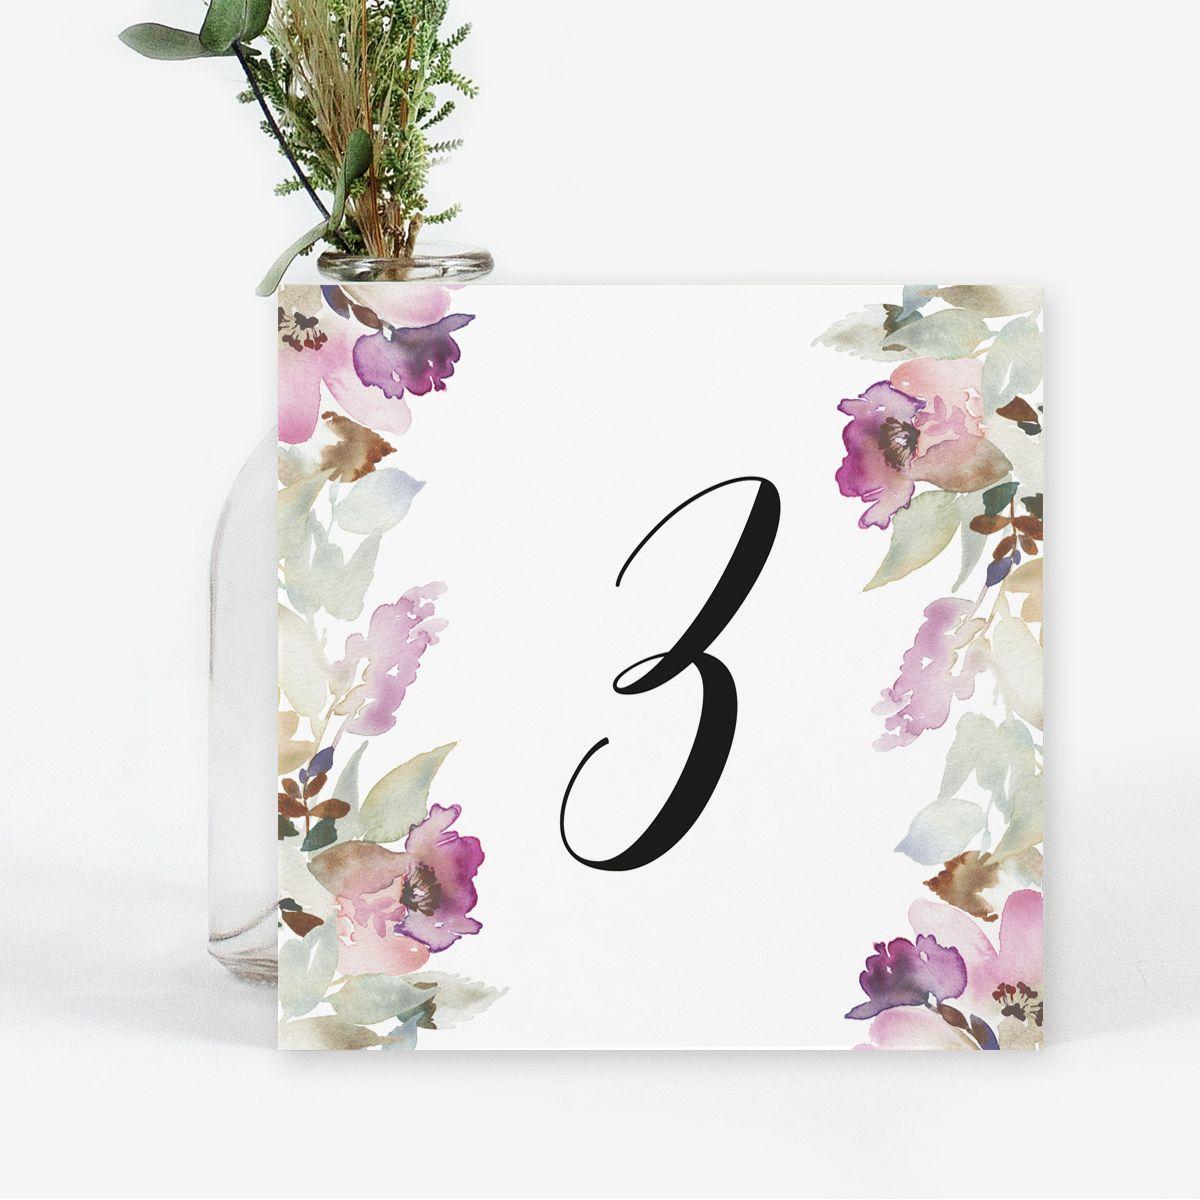 Número mesa boda Lidia